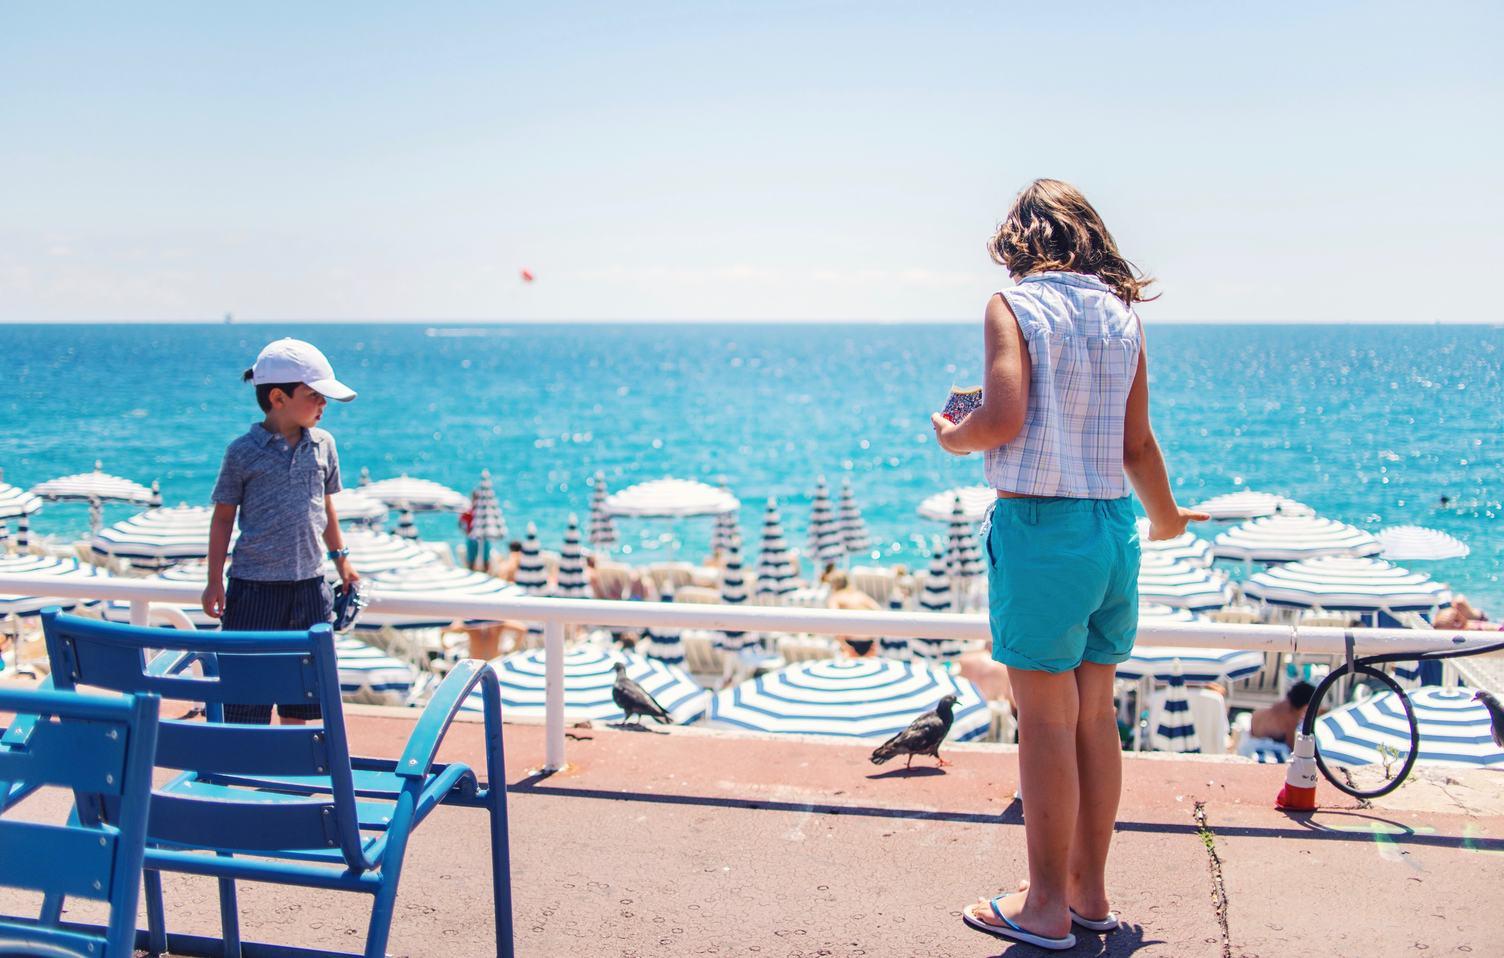 Summer Vacation Children Feeding Pigeons on the Beach